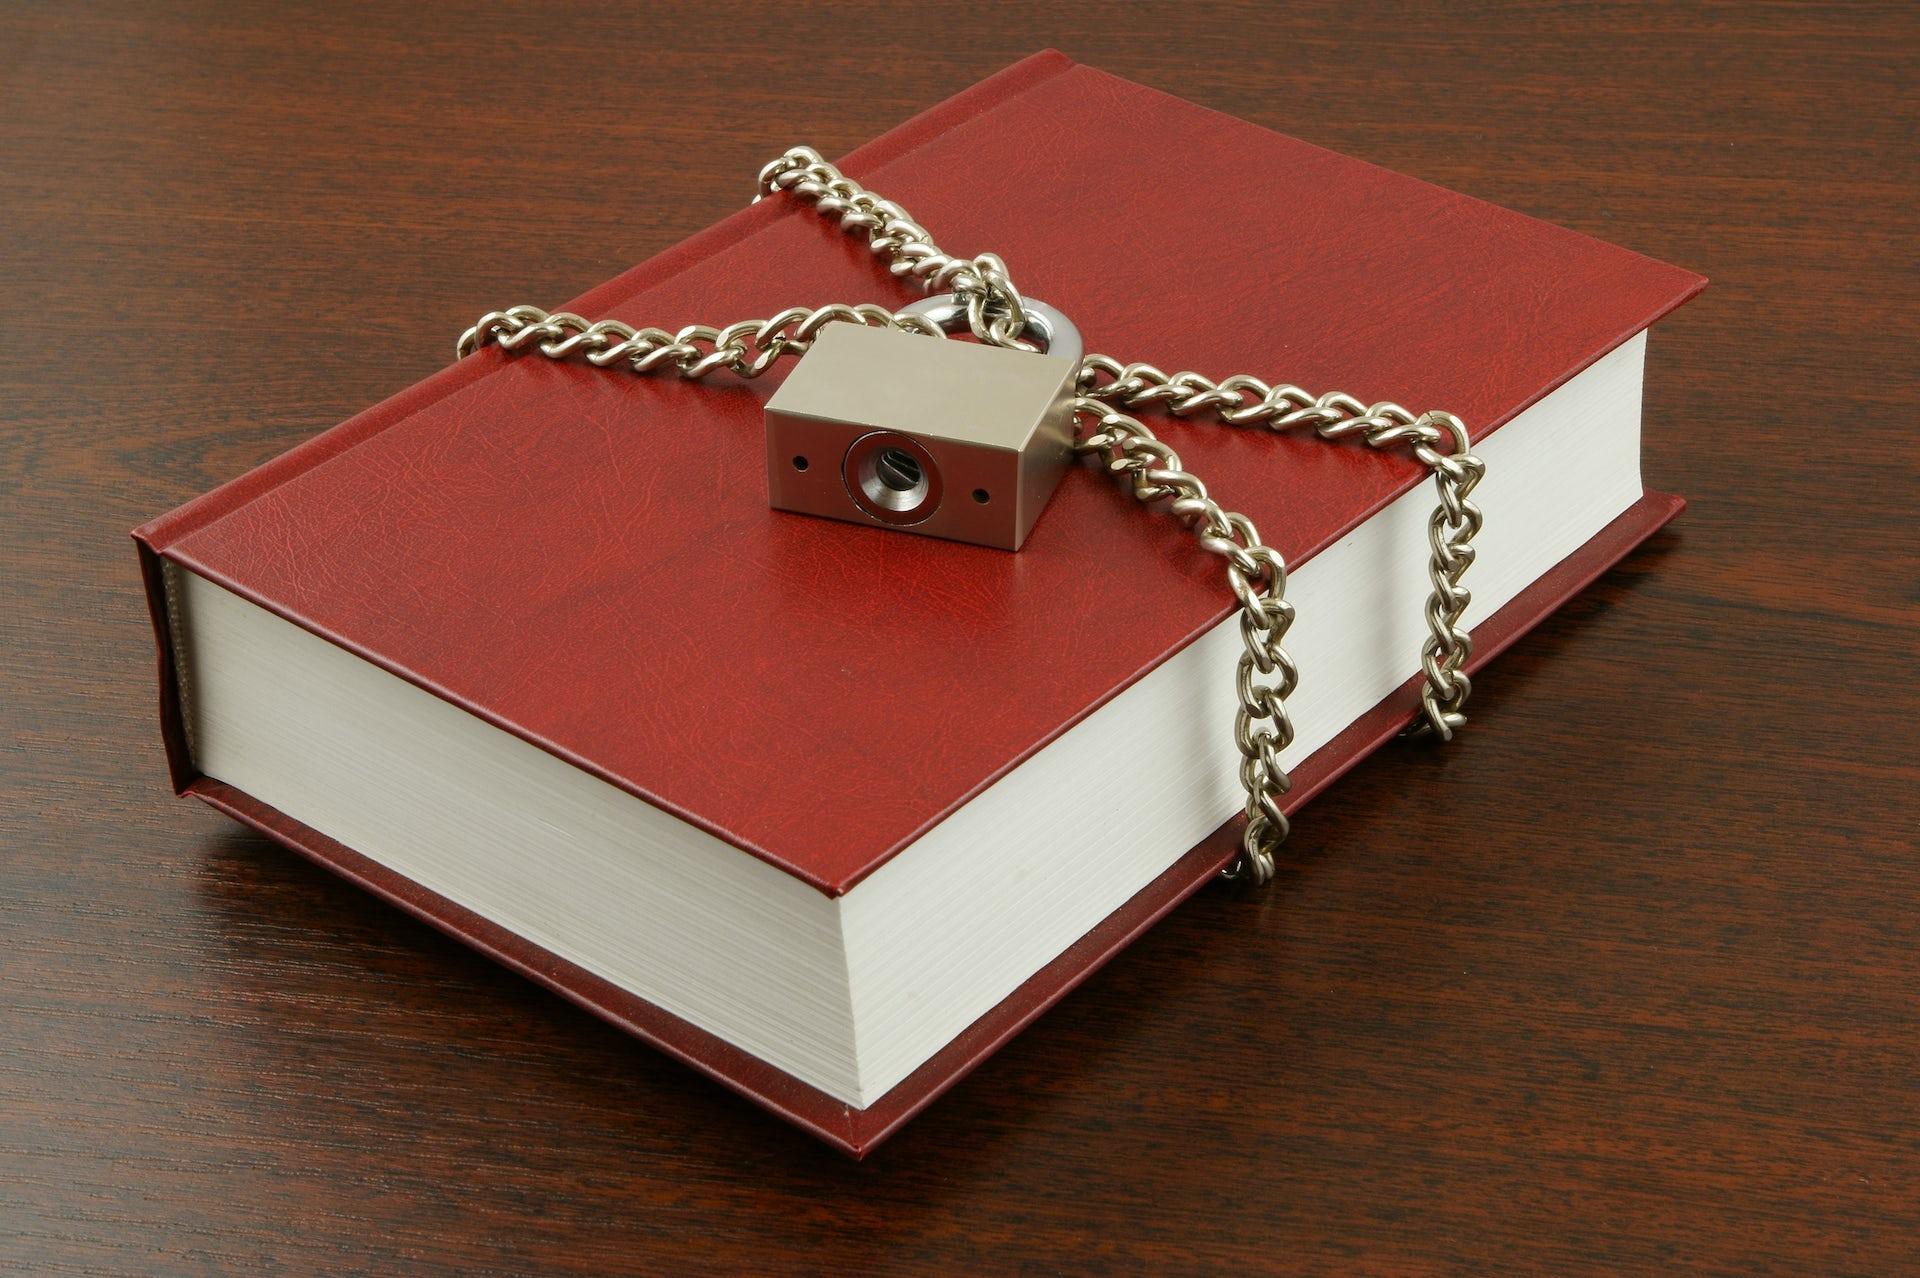 Popular research paper ghostwriting service uk